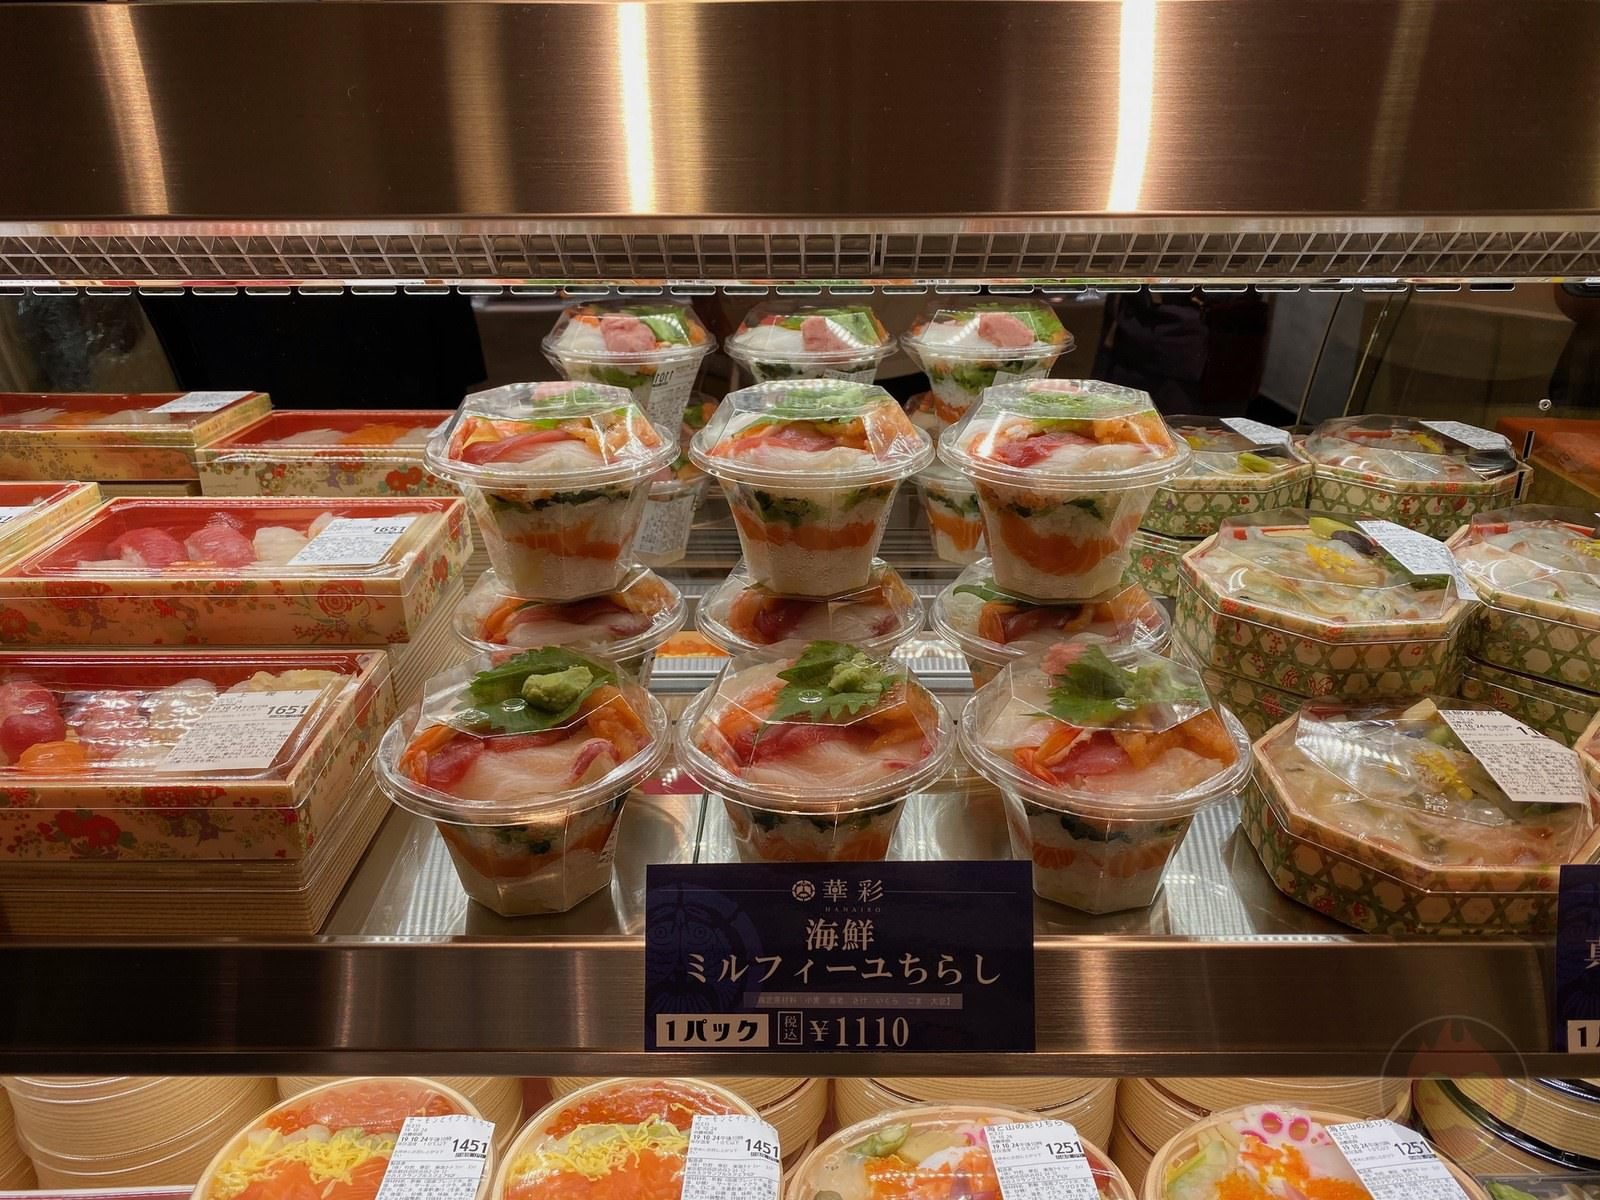 Shibuya-Scramble-Square-Food-I-Ate-121.jpeg